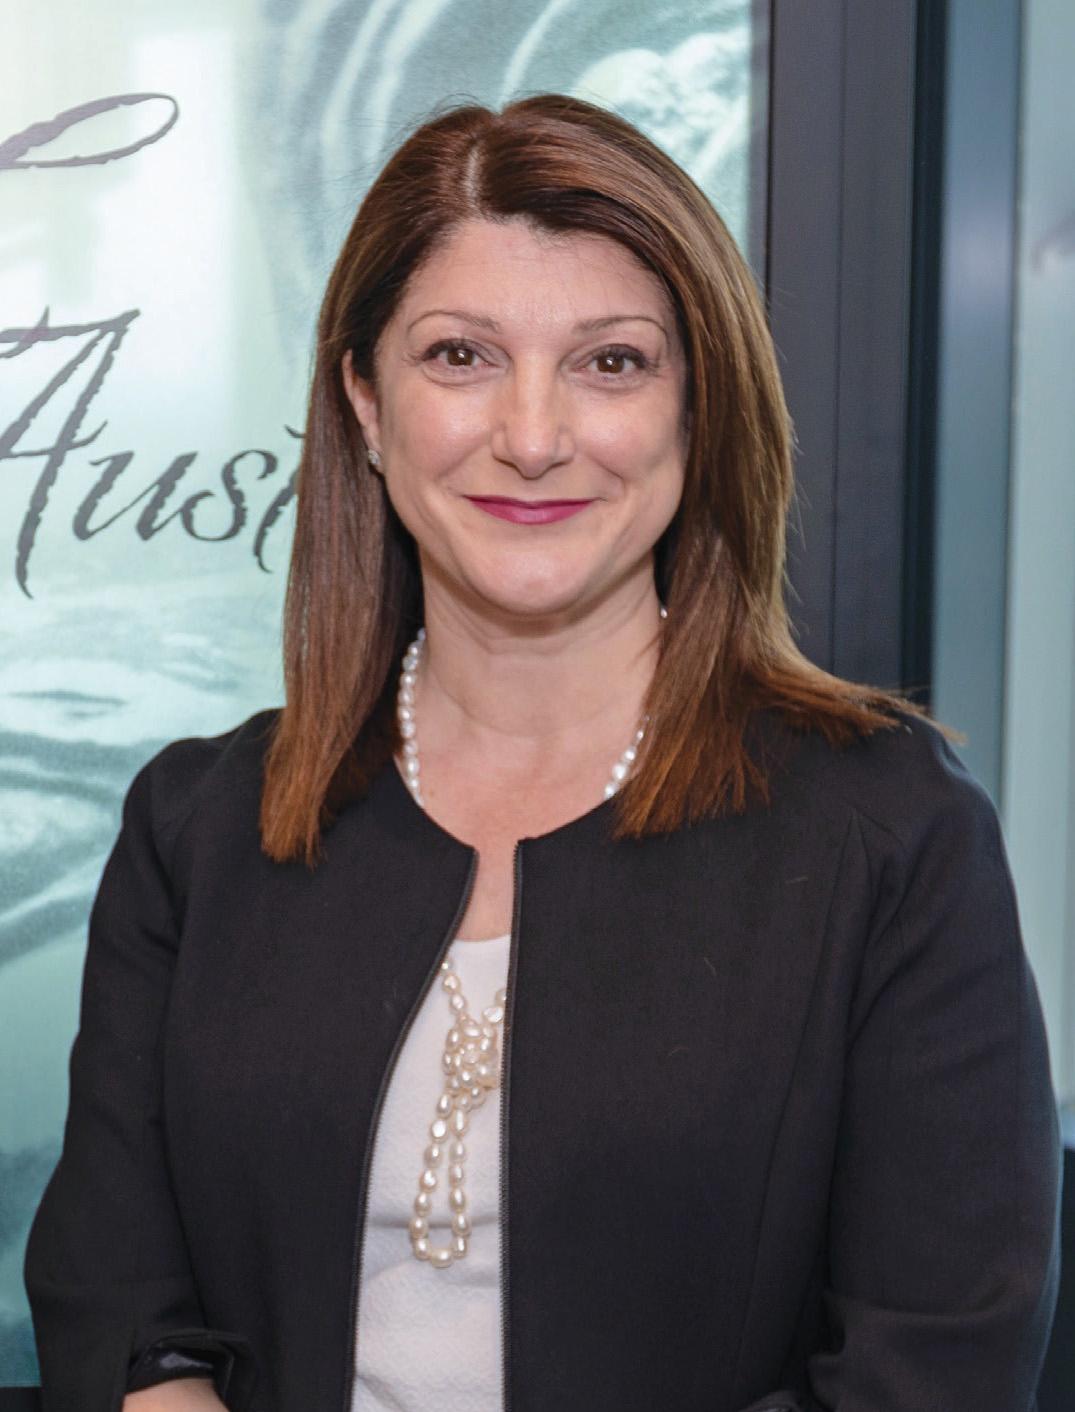 Alice Del Vecchio, head of distribution, retail banking and wealth management, HSBC Australia